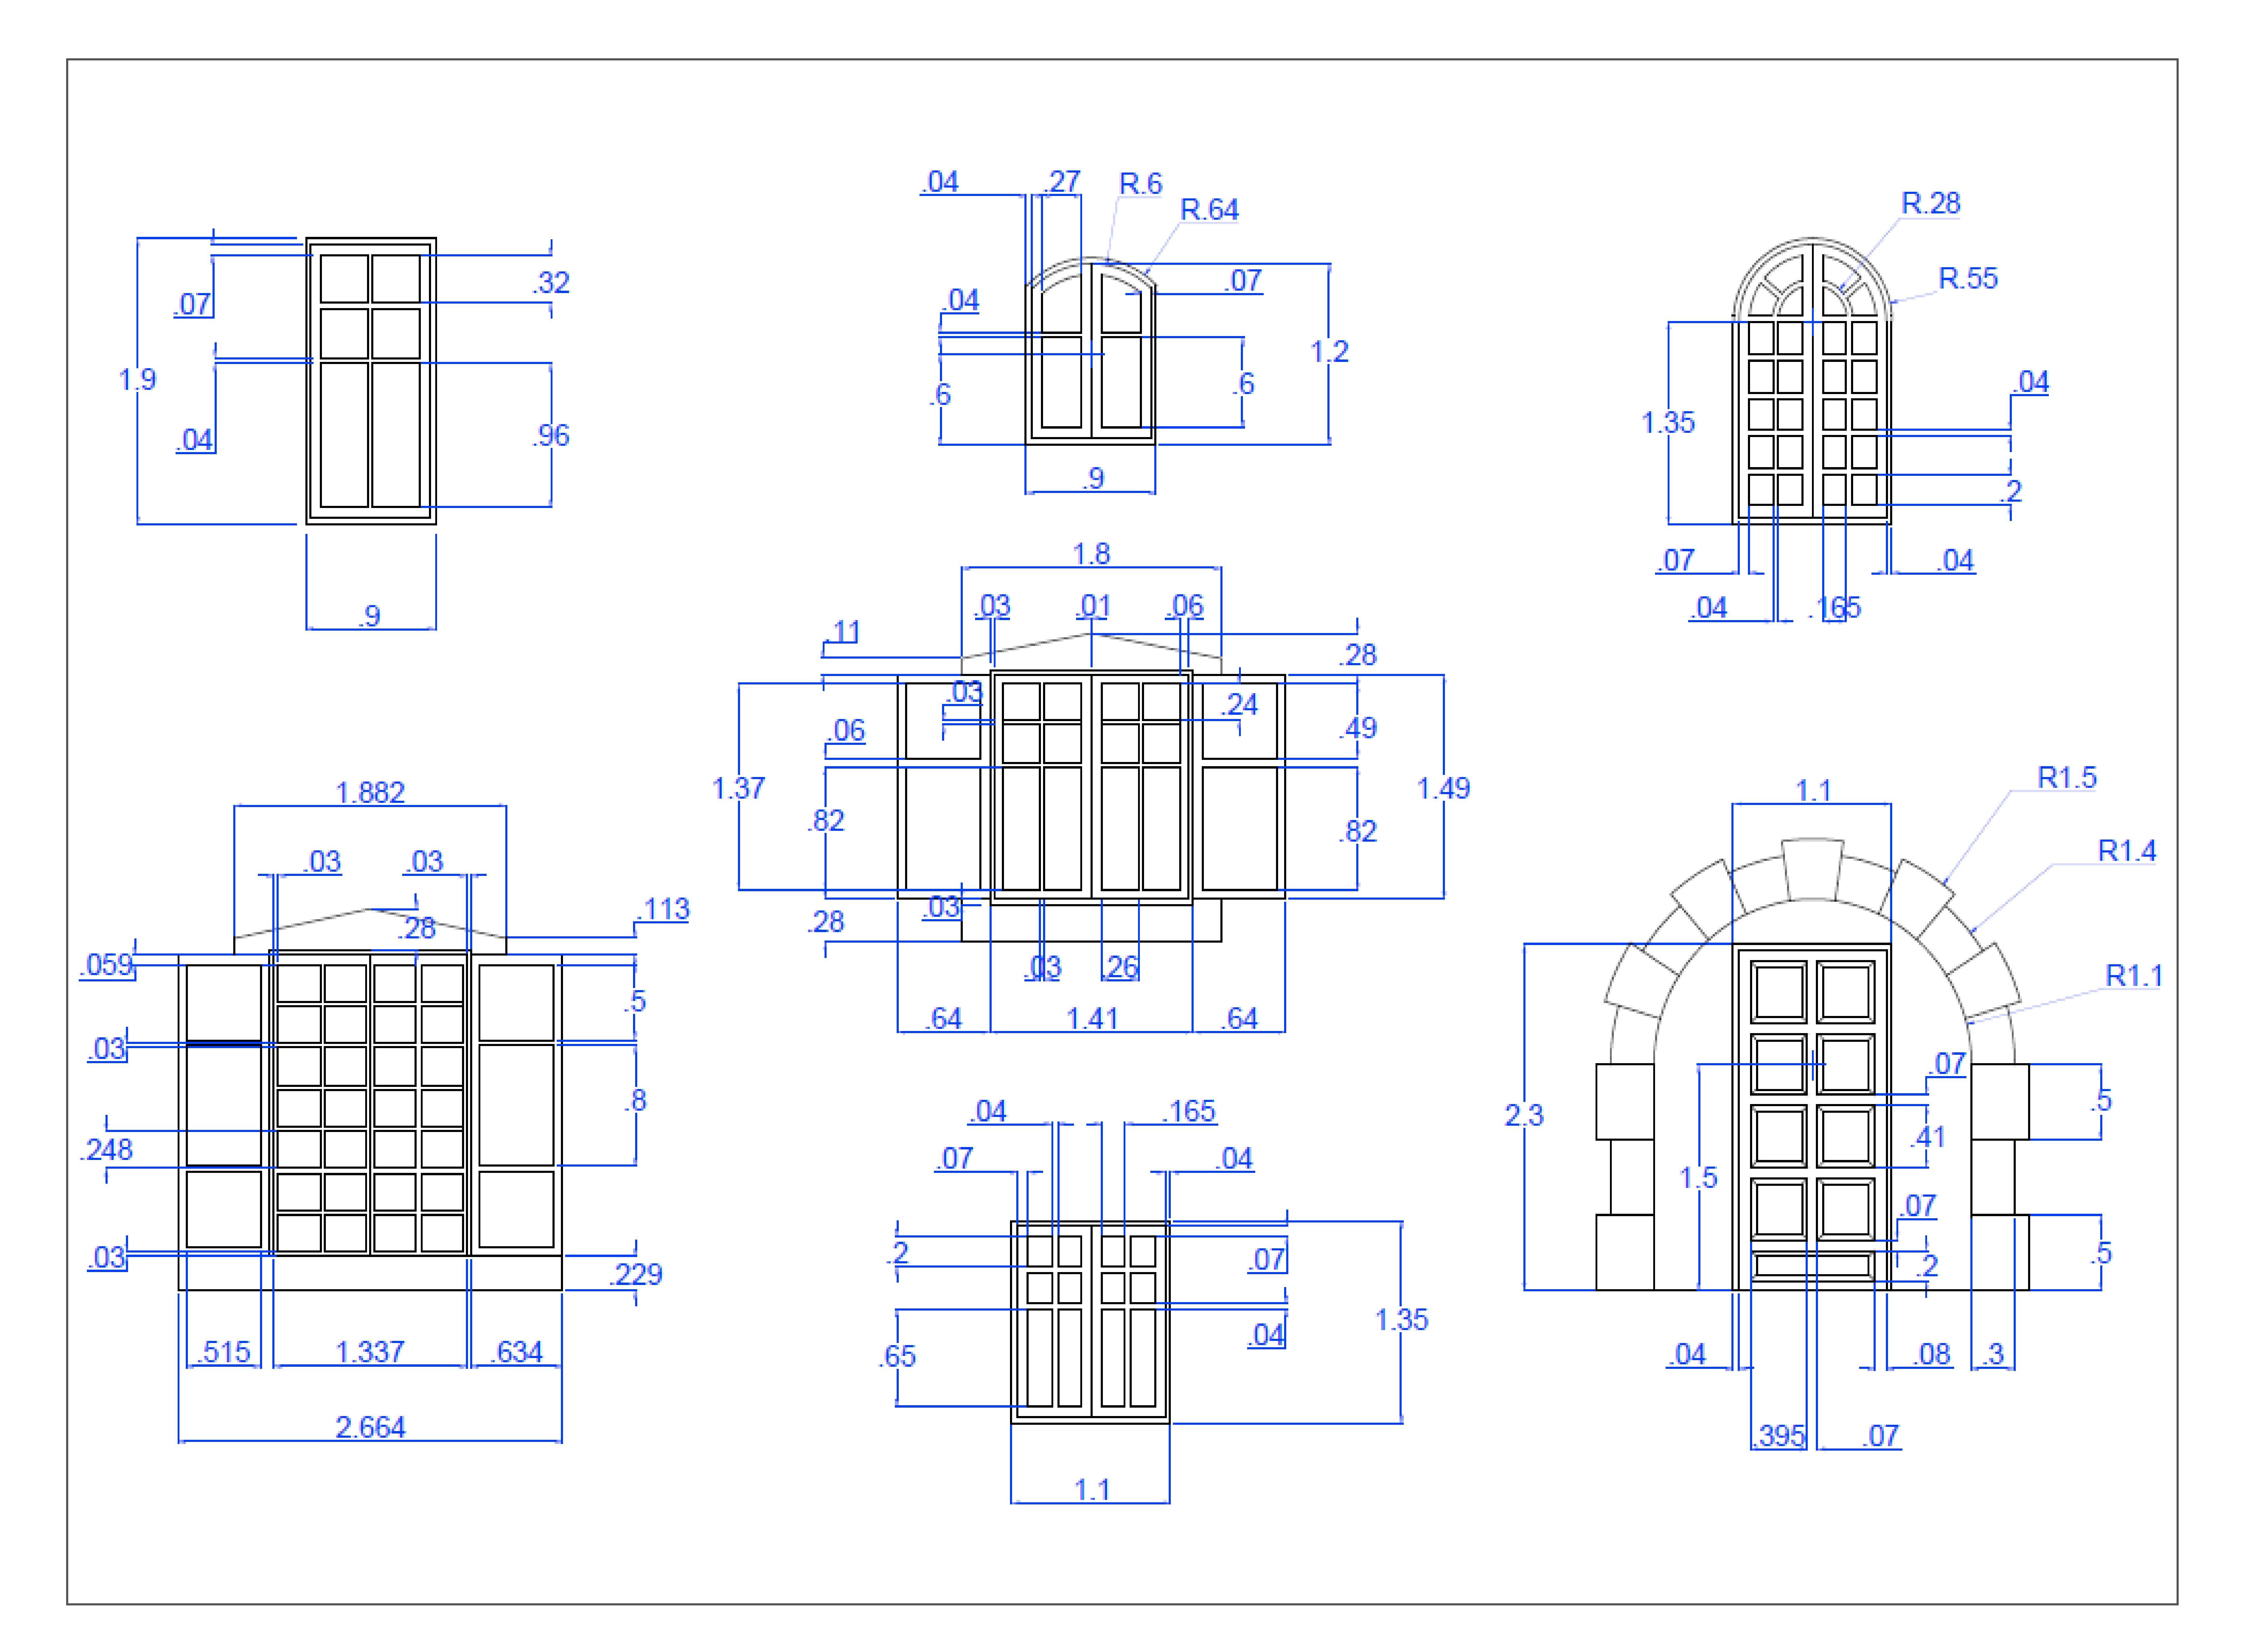 Anexo Puerta Y Ventanas Bloques Sin Medidas Autocad Diagram Architecture Gate Design